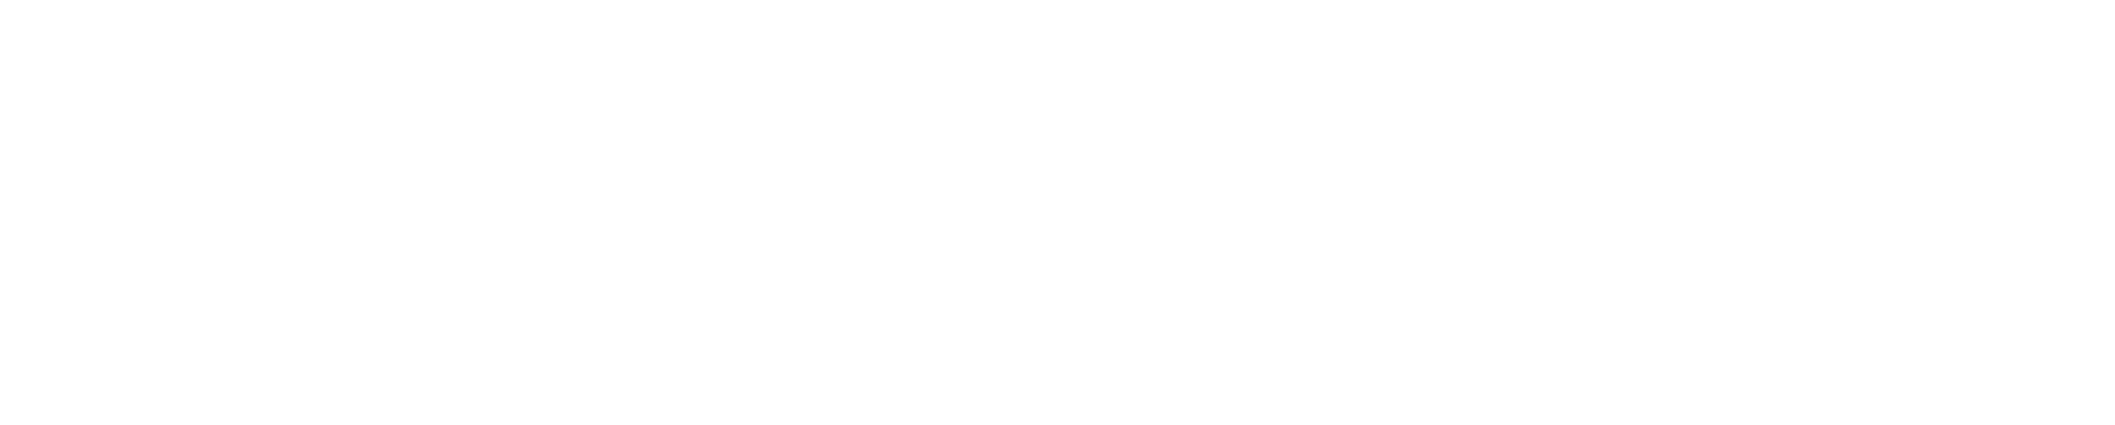 Company Name - City, State